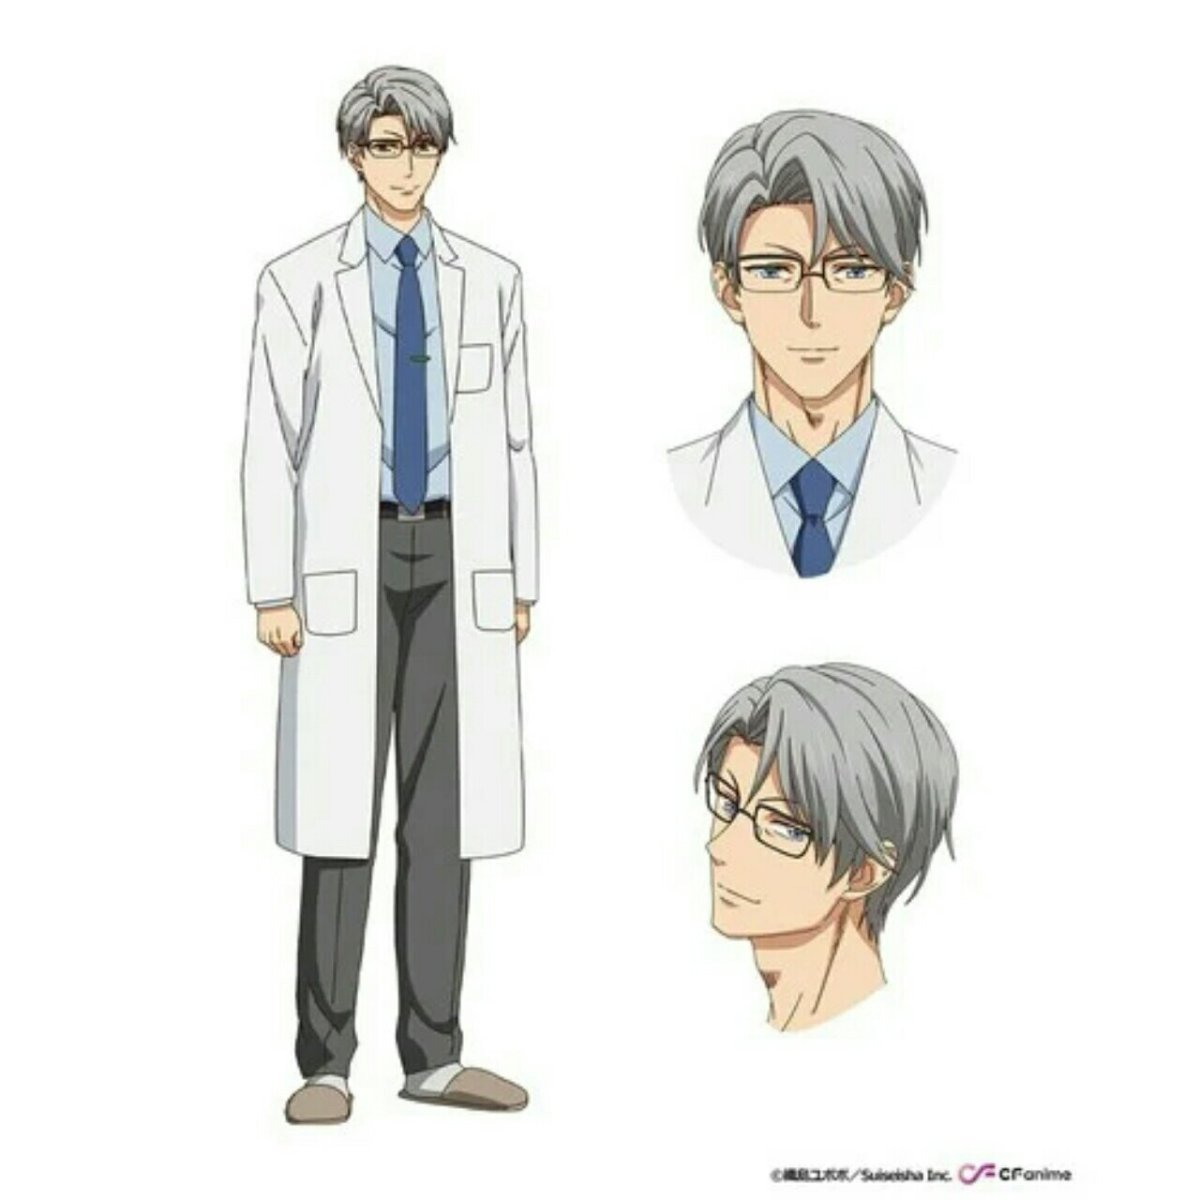 Makoto Furukawa dan Kazutomi Yamamoto Menarasikan Video Promosi Anime 'I Became a Kuro-Gyaru so I F***ed My Best Friend' 5